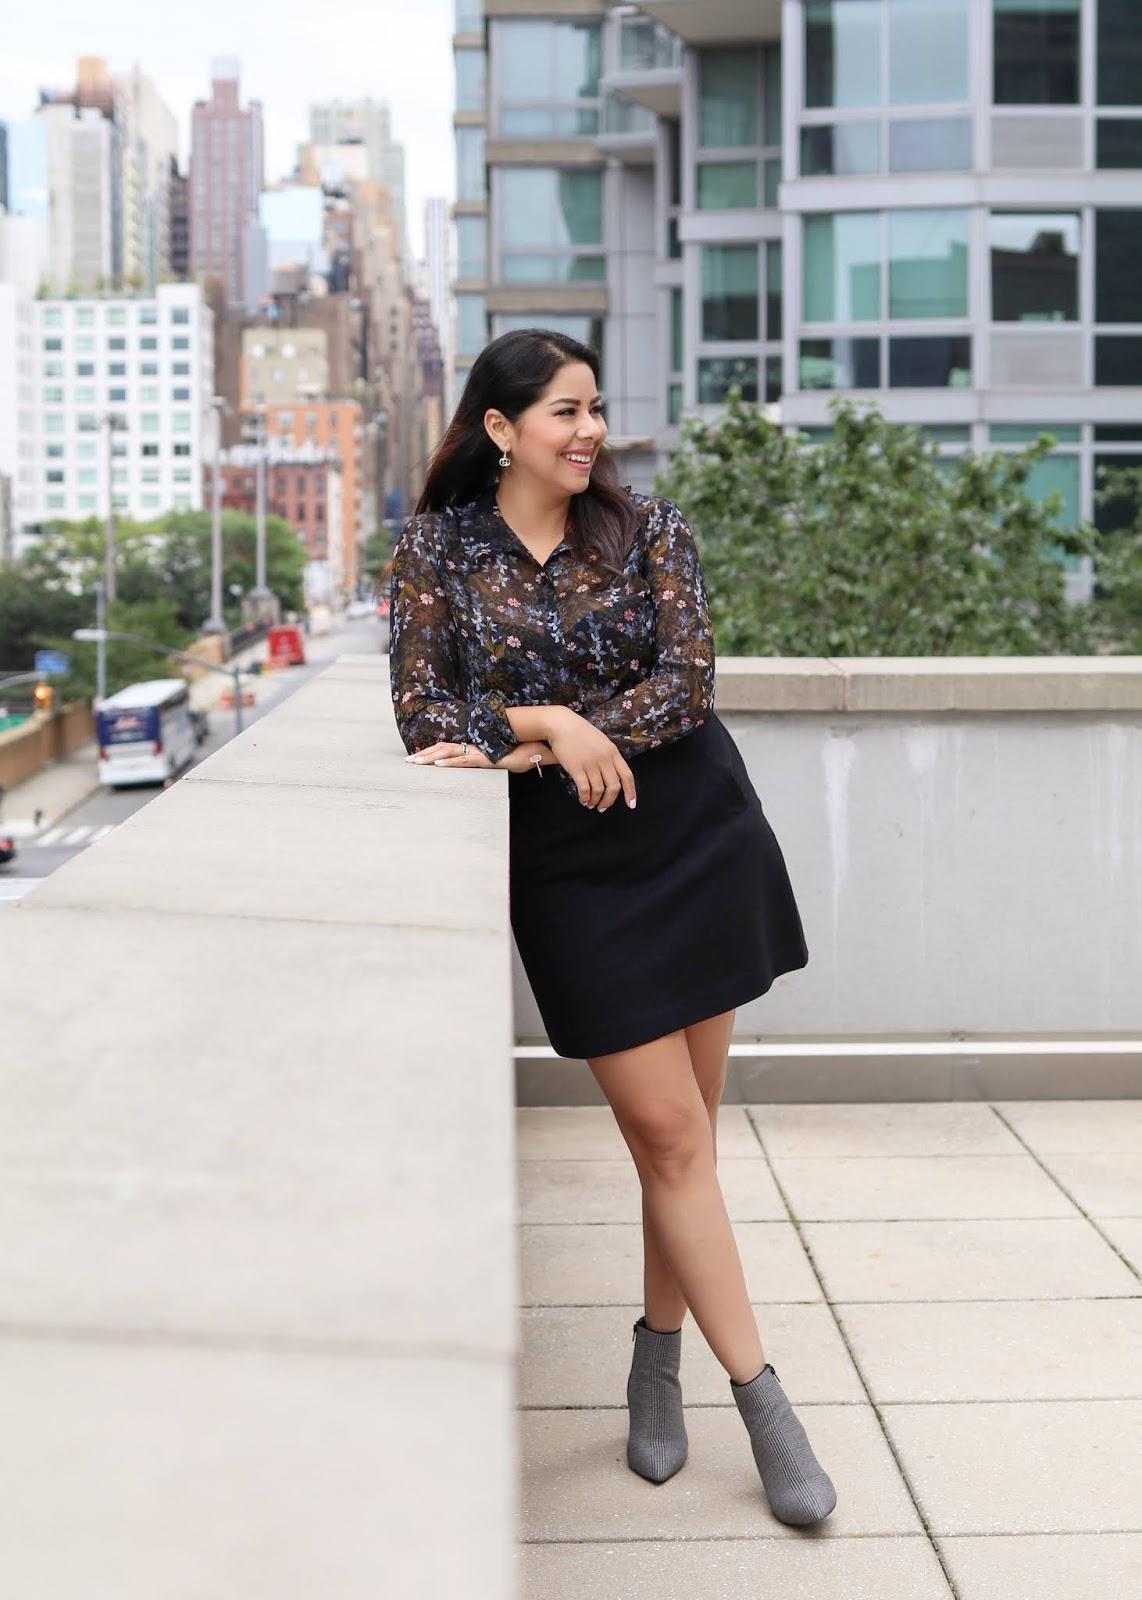 NYC style and fashion, latina fashion blogger